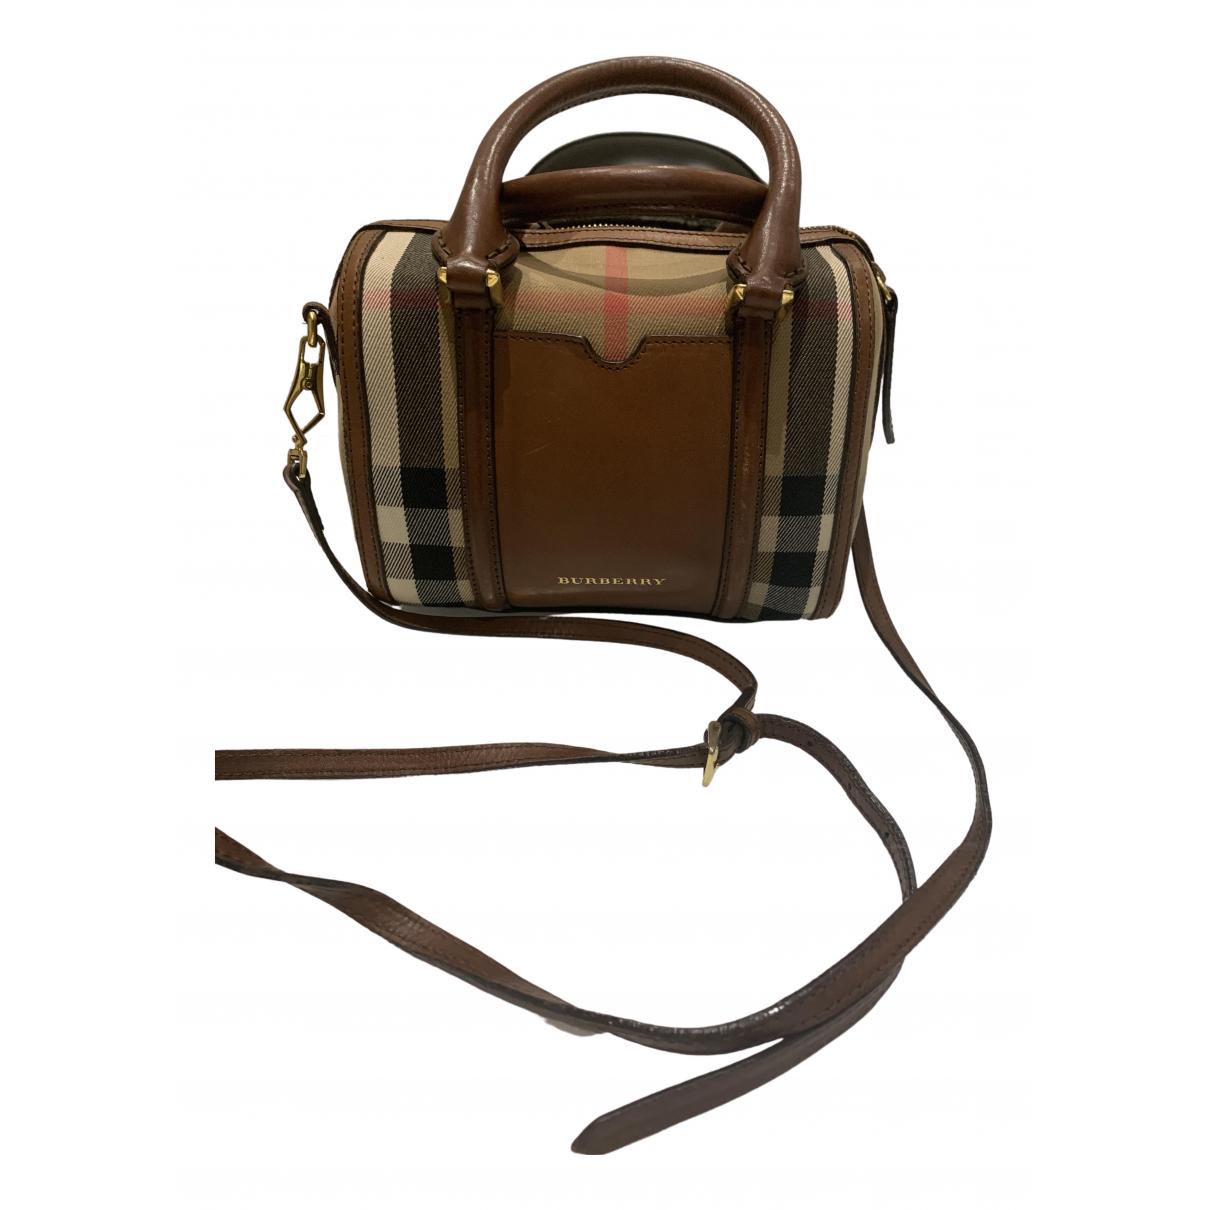 Burberry \N Handtasche in  Beige Baumwolle